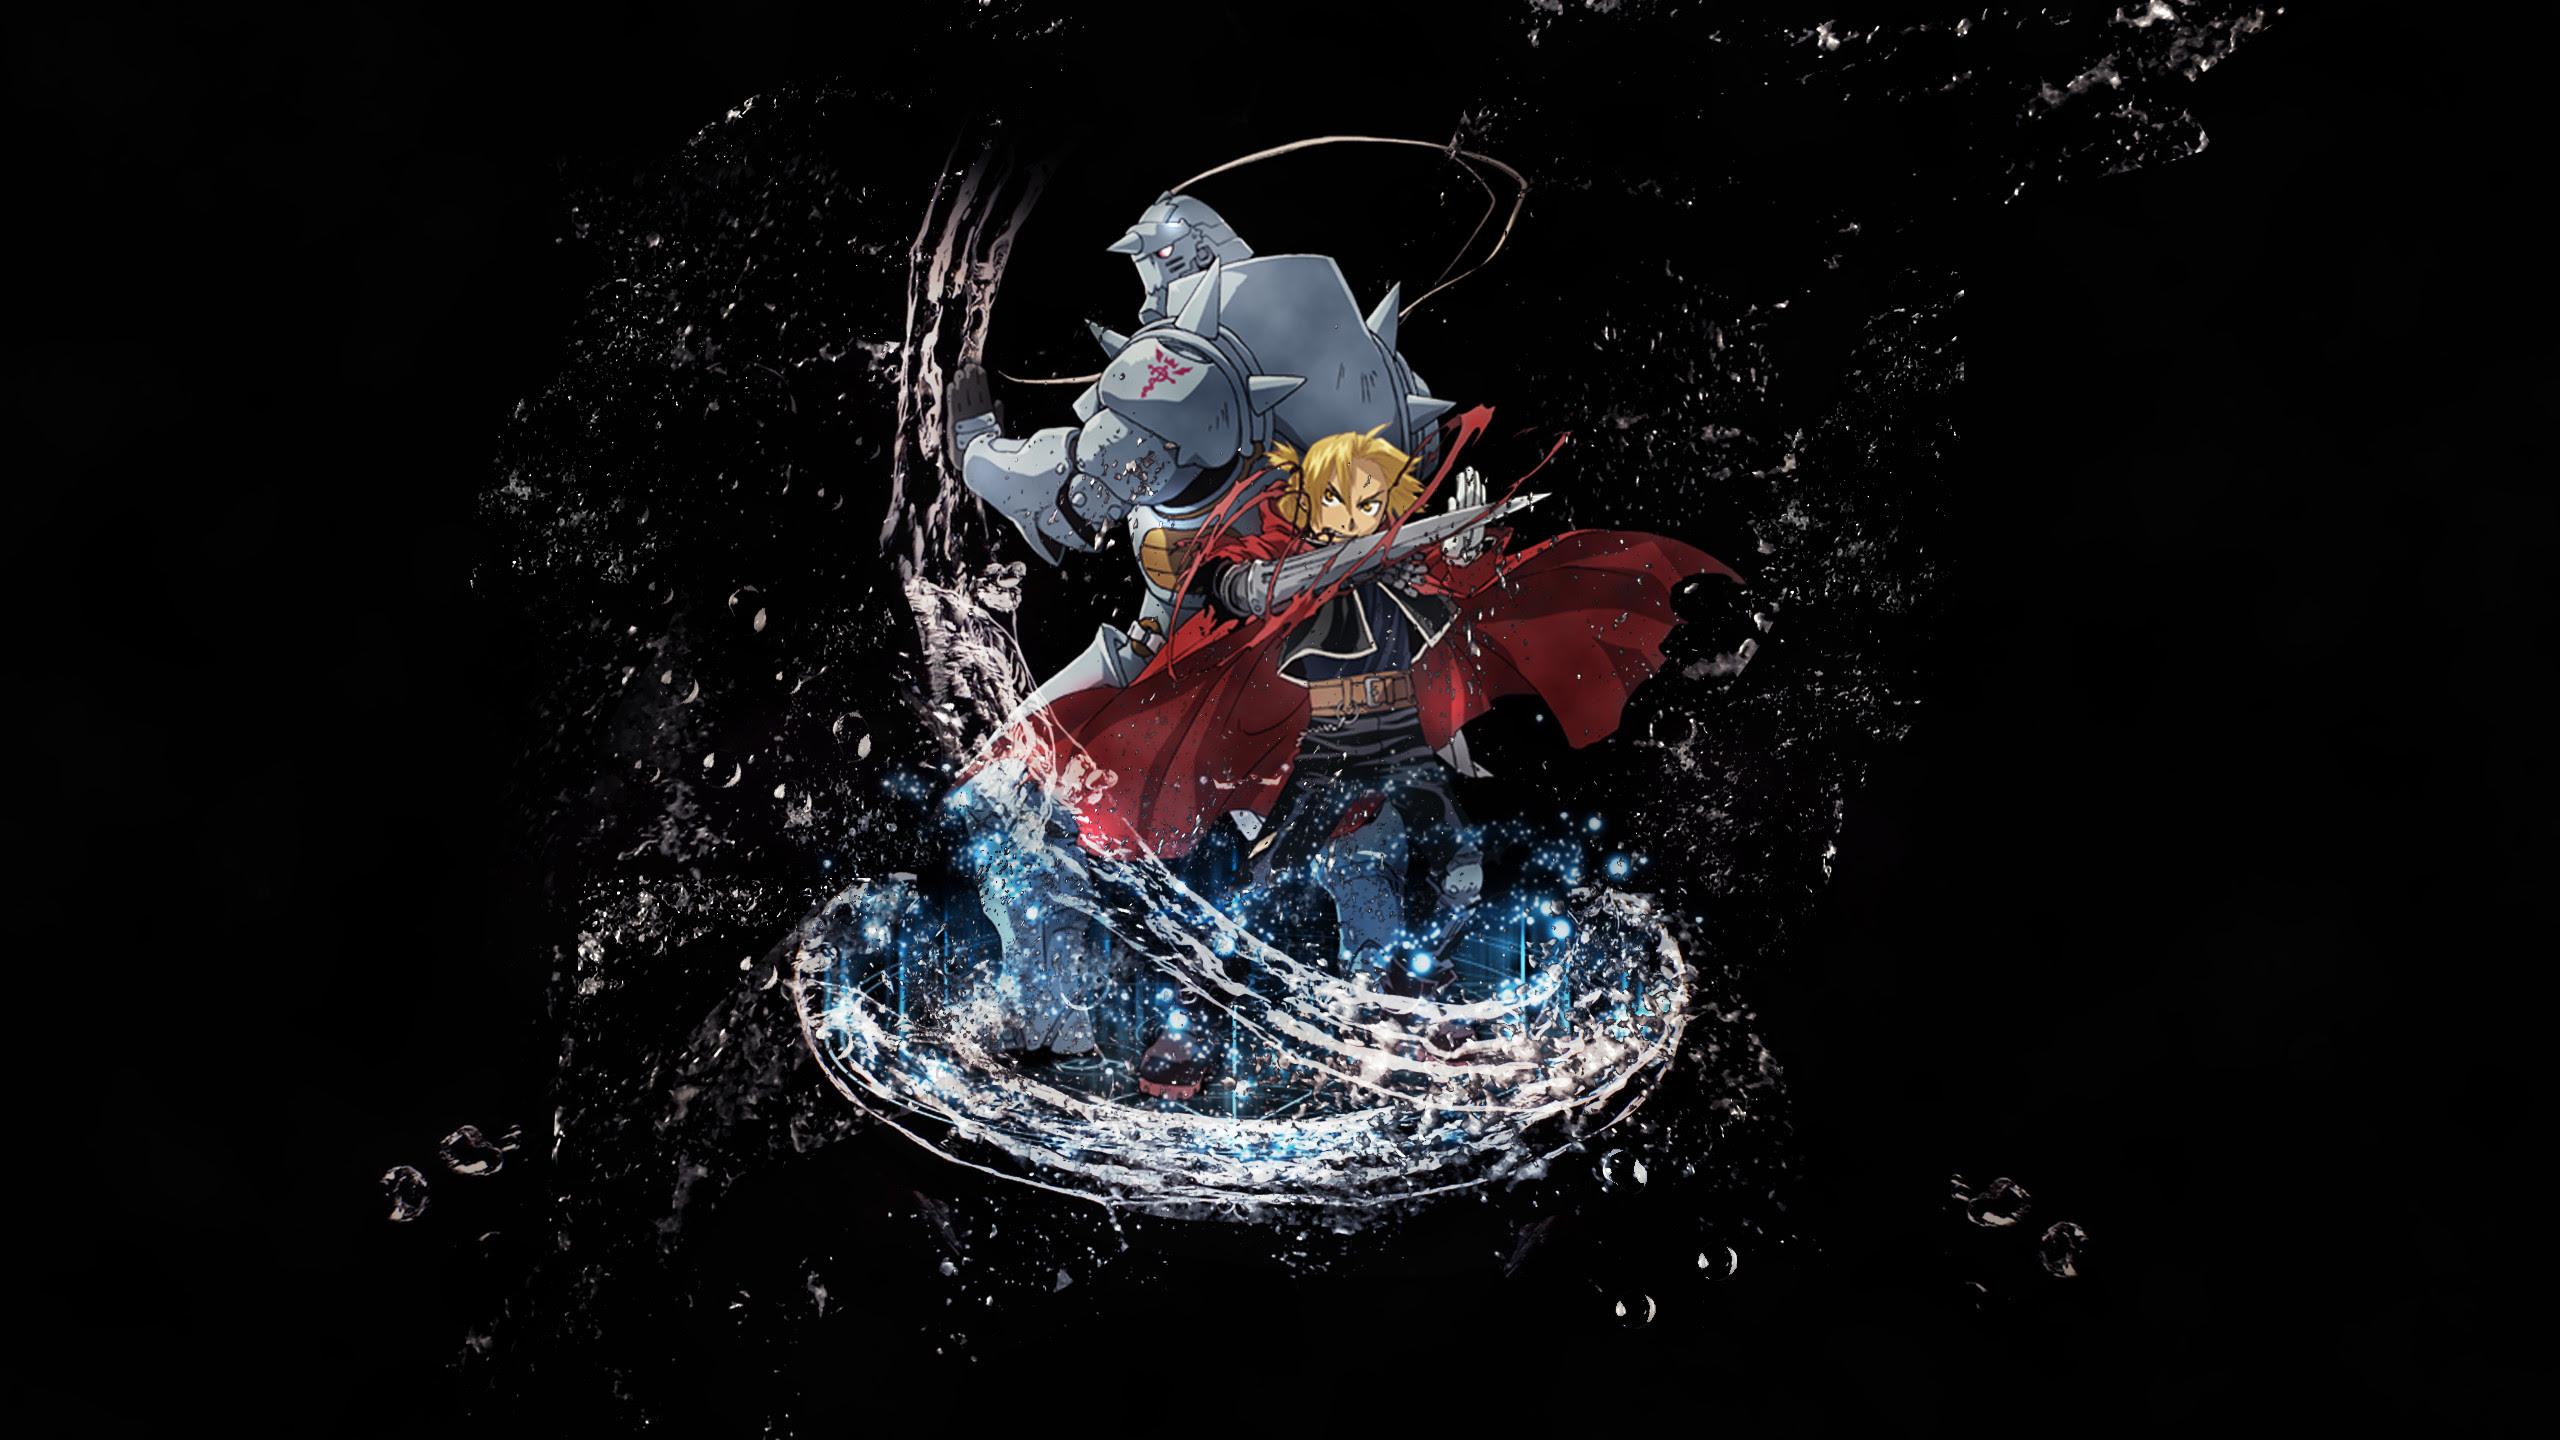 Fullmetal Alchemist Phone Wallpaper 69 Images